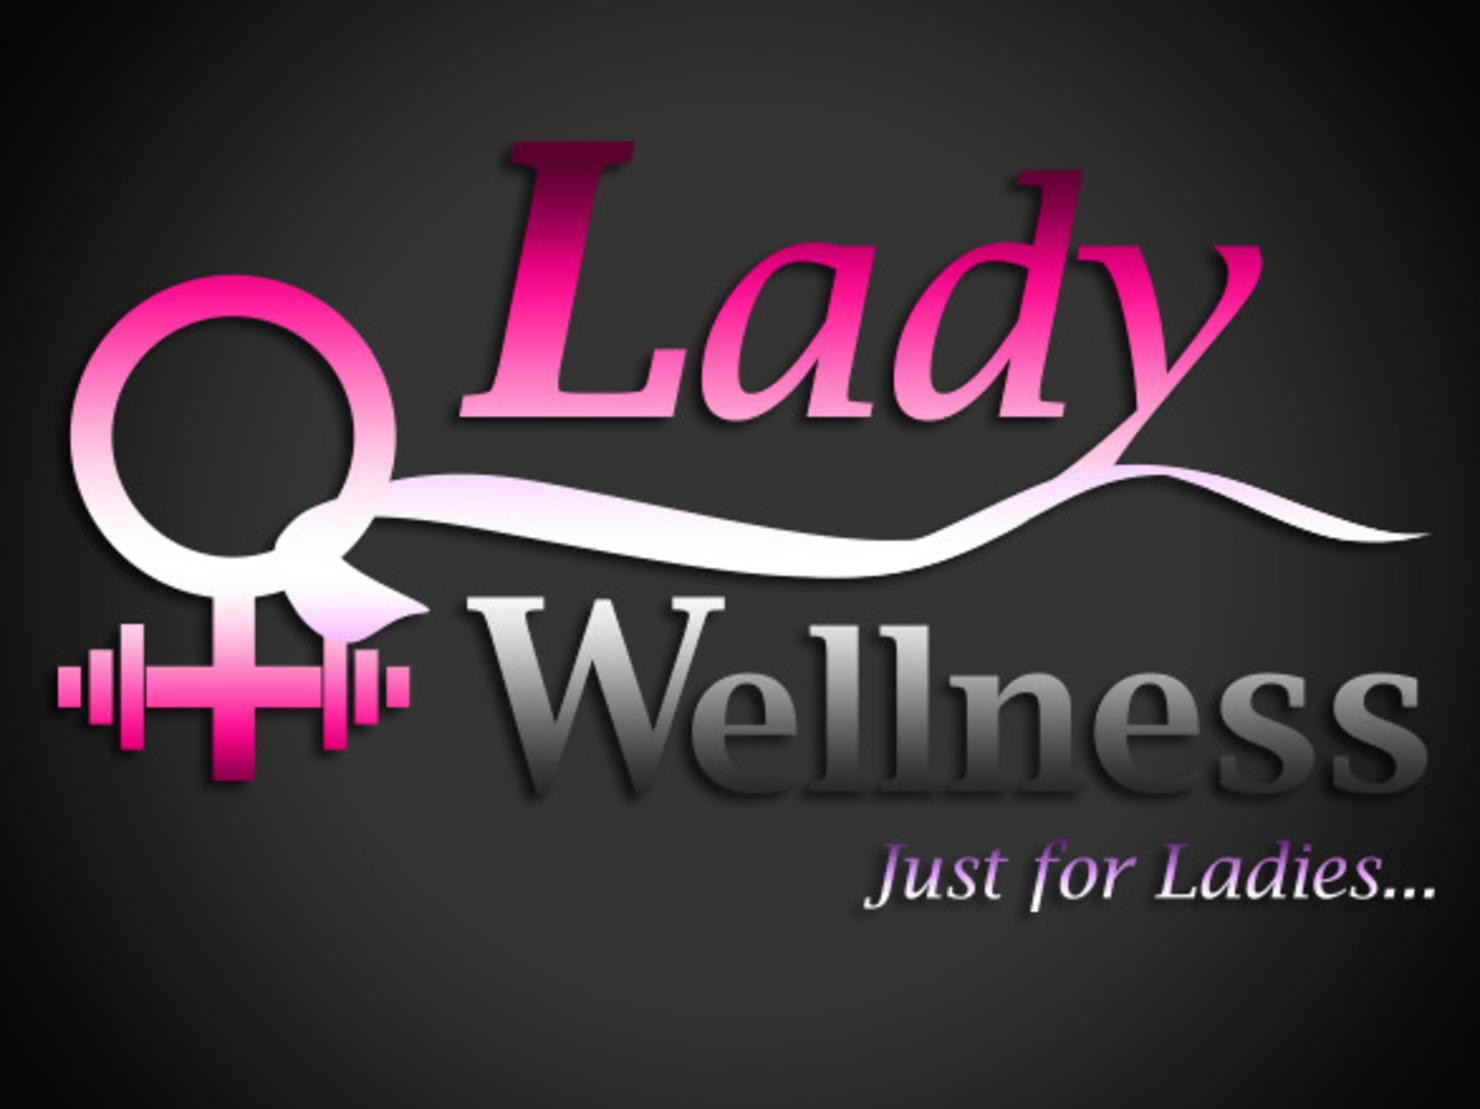 lady wellness dijon tarifs avis horaires essai gratuit. Black Bedroom Furniture Sets. Home Design Ideas